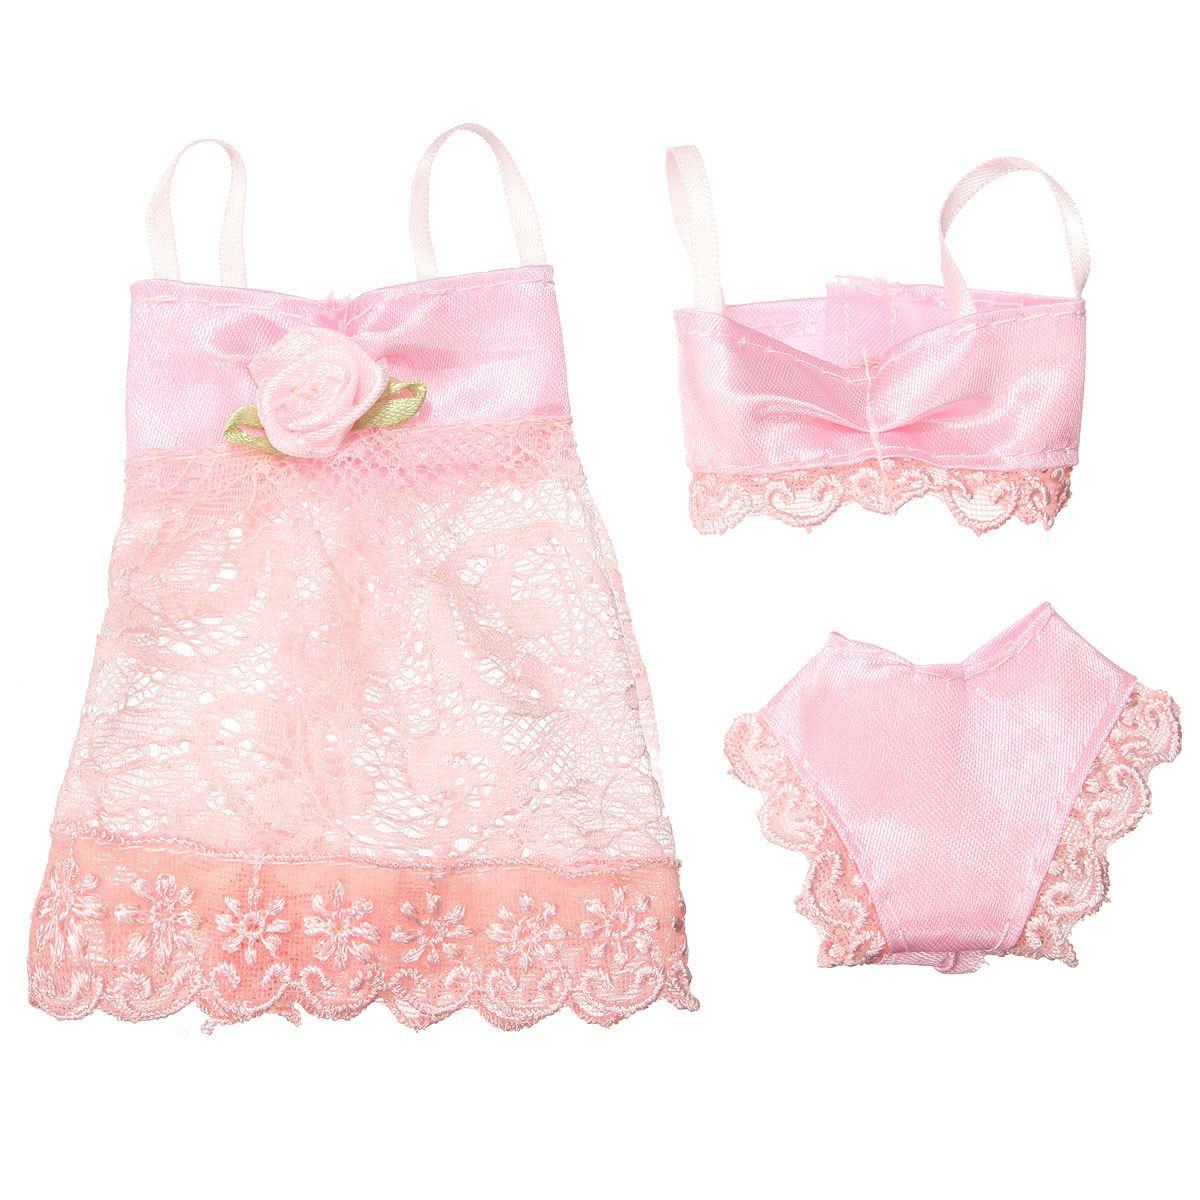 3PCS/Set Colourful Attractive Pajamas Lingerie Lace Night time Gown + Bra + Underwear Garments For Barbie DollSkirt Garments Dolls Accessorie